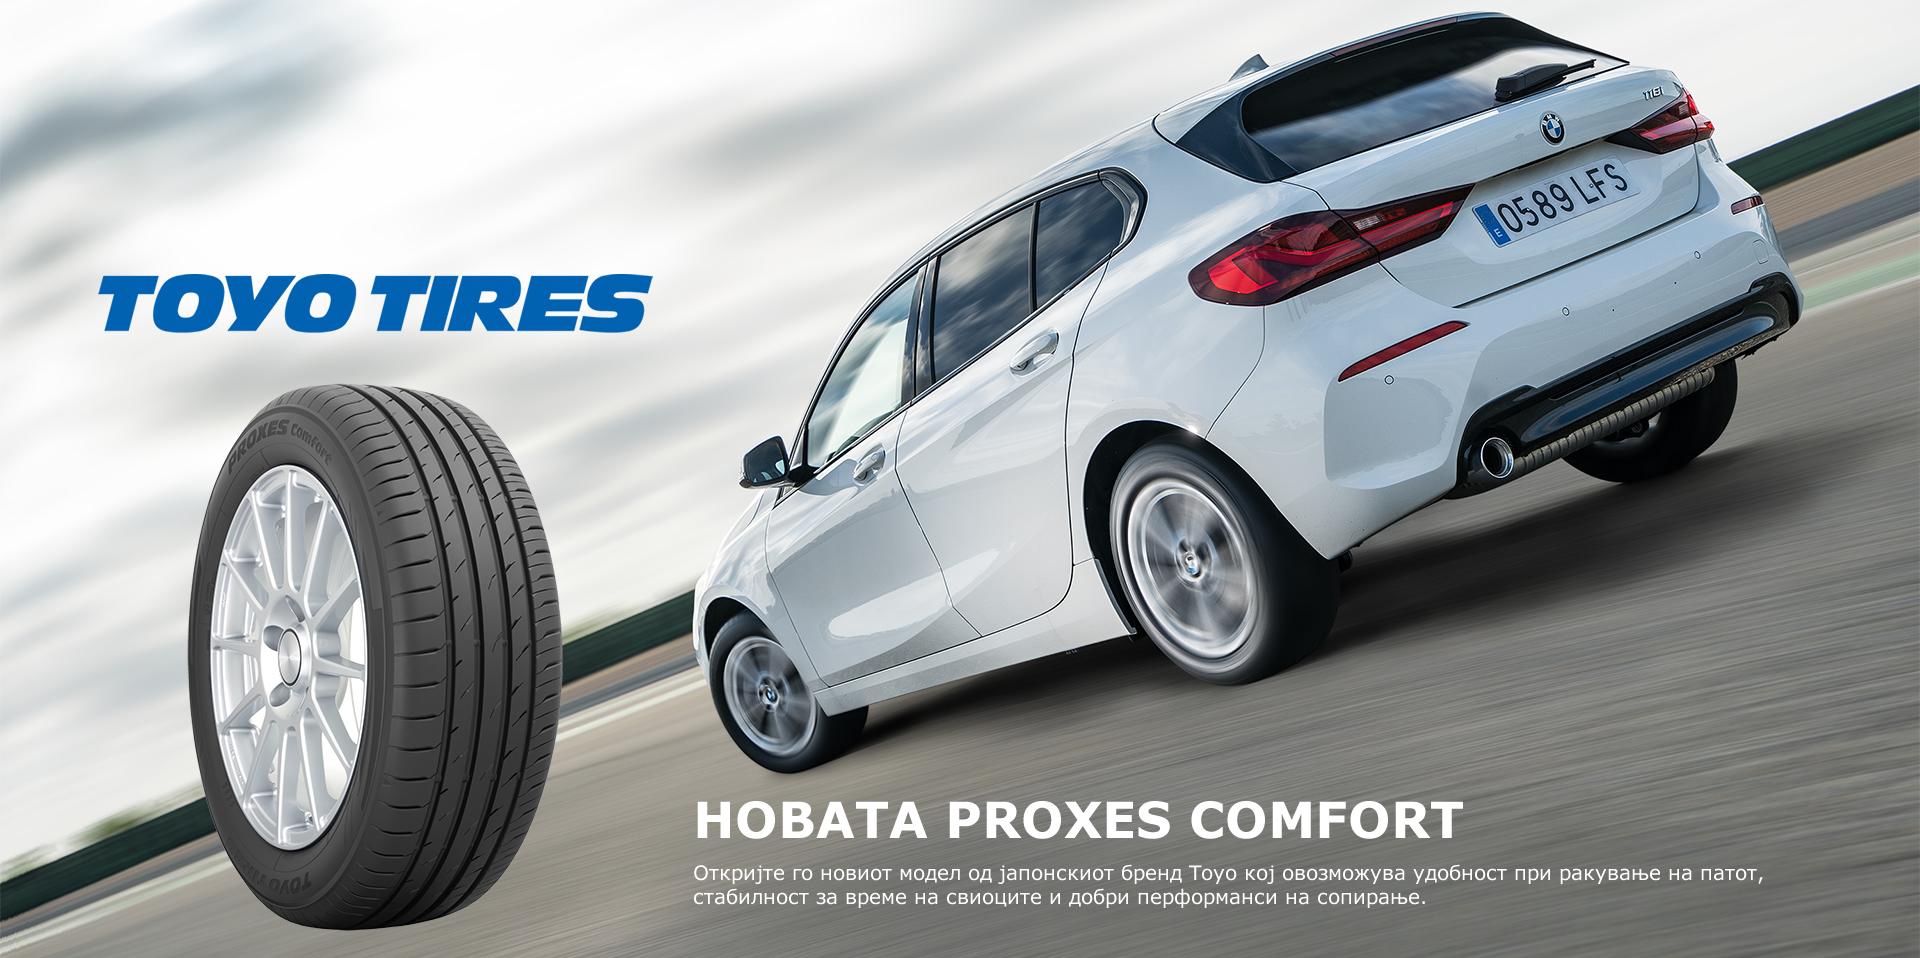 Proxes Comfort web banner MTC